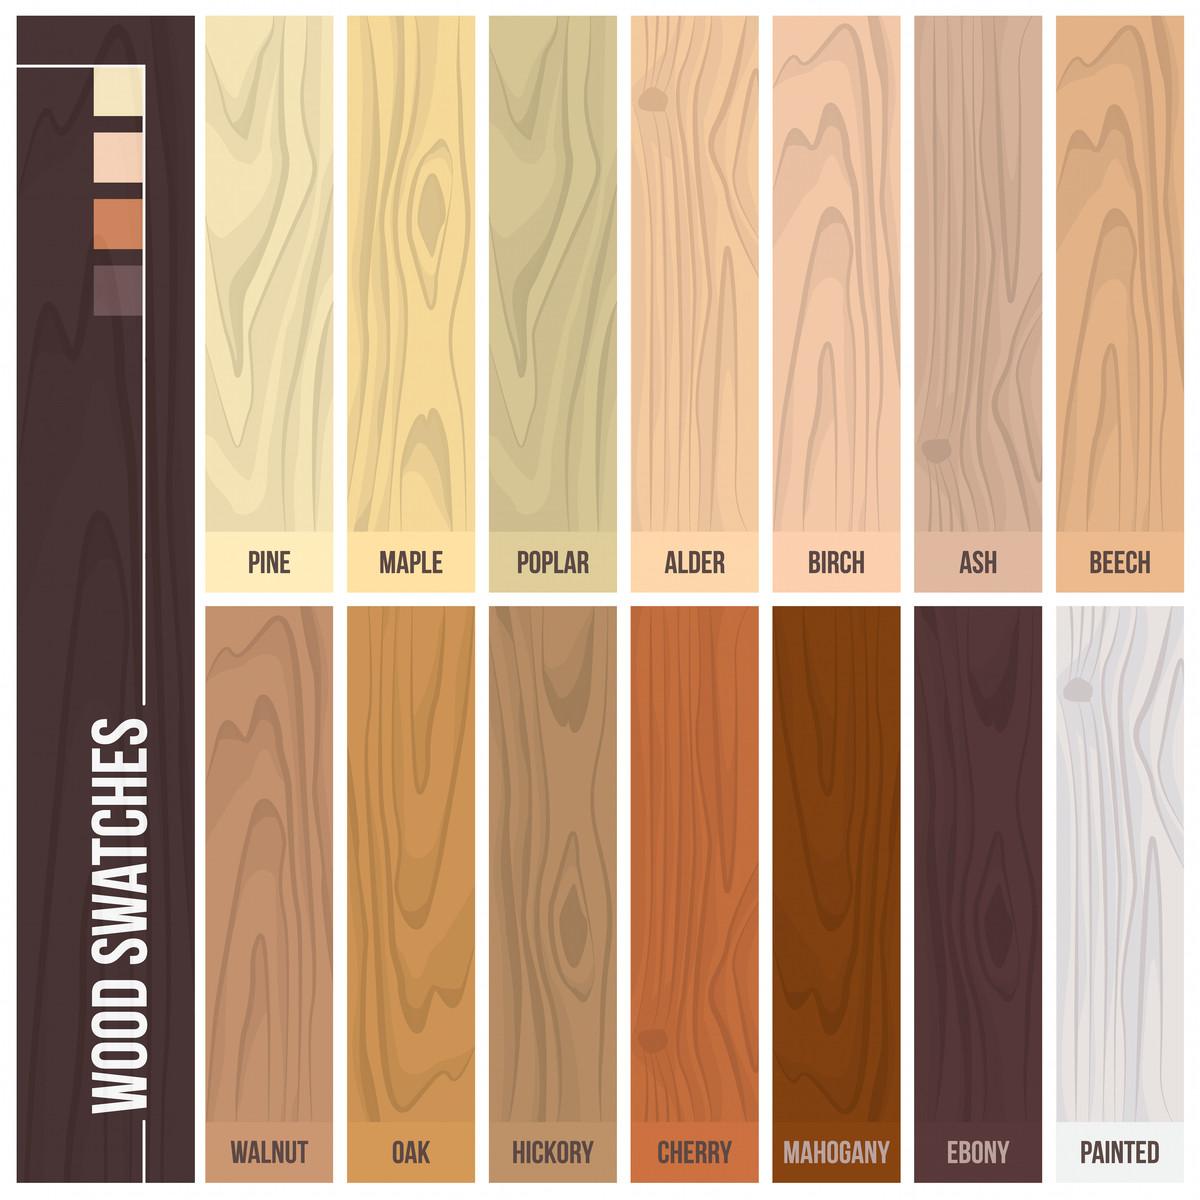 hardwood floor cleaner mop of 12 types of hardwood flooring species styles edging dimensions pertaining to types of hardwood flooring illustrated guide